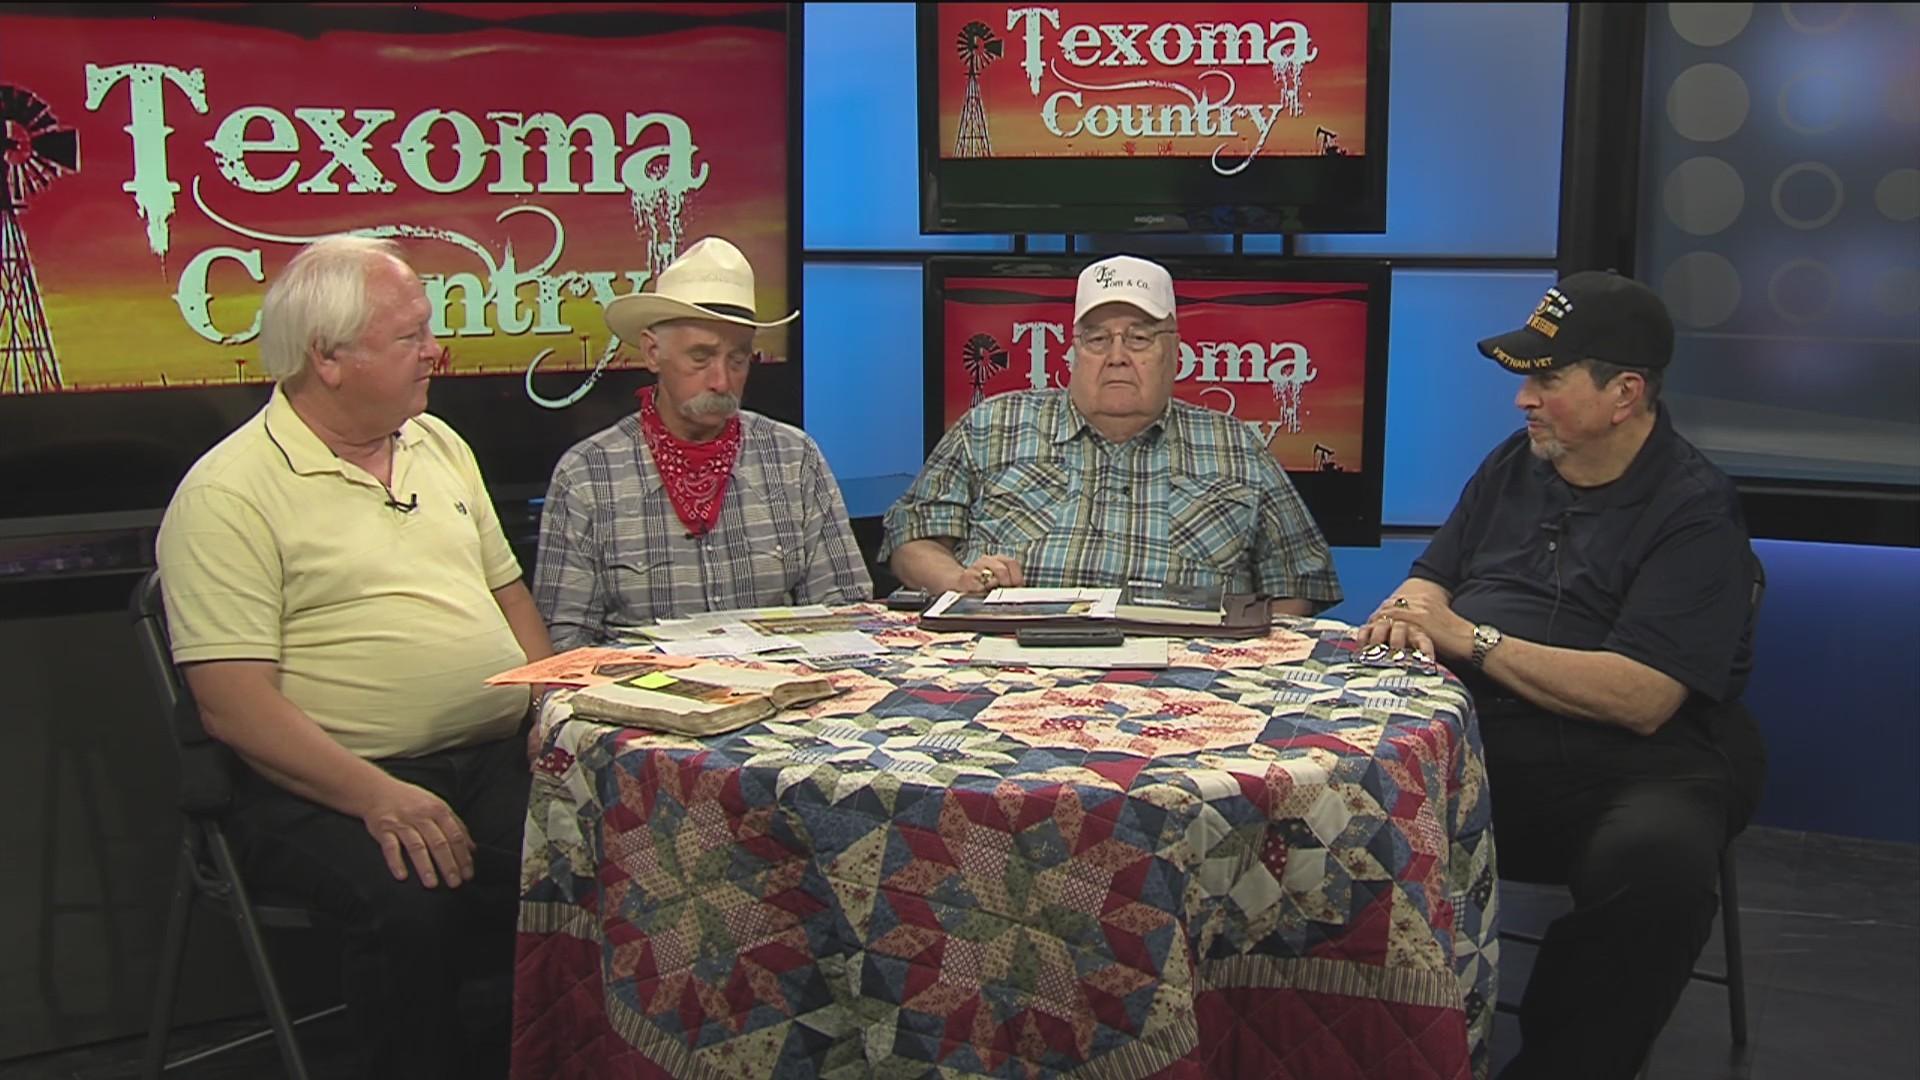 Texoma Country Morning 10/5/18 4